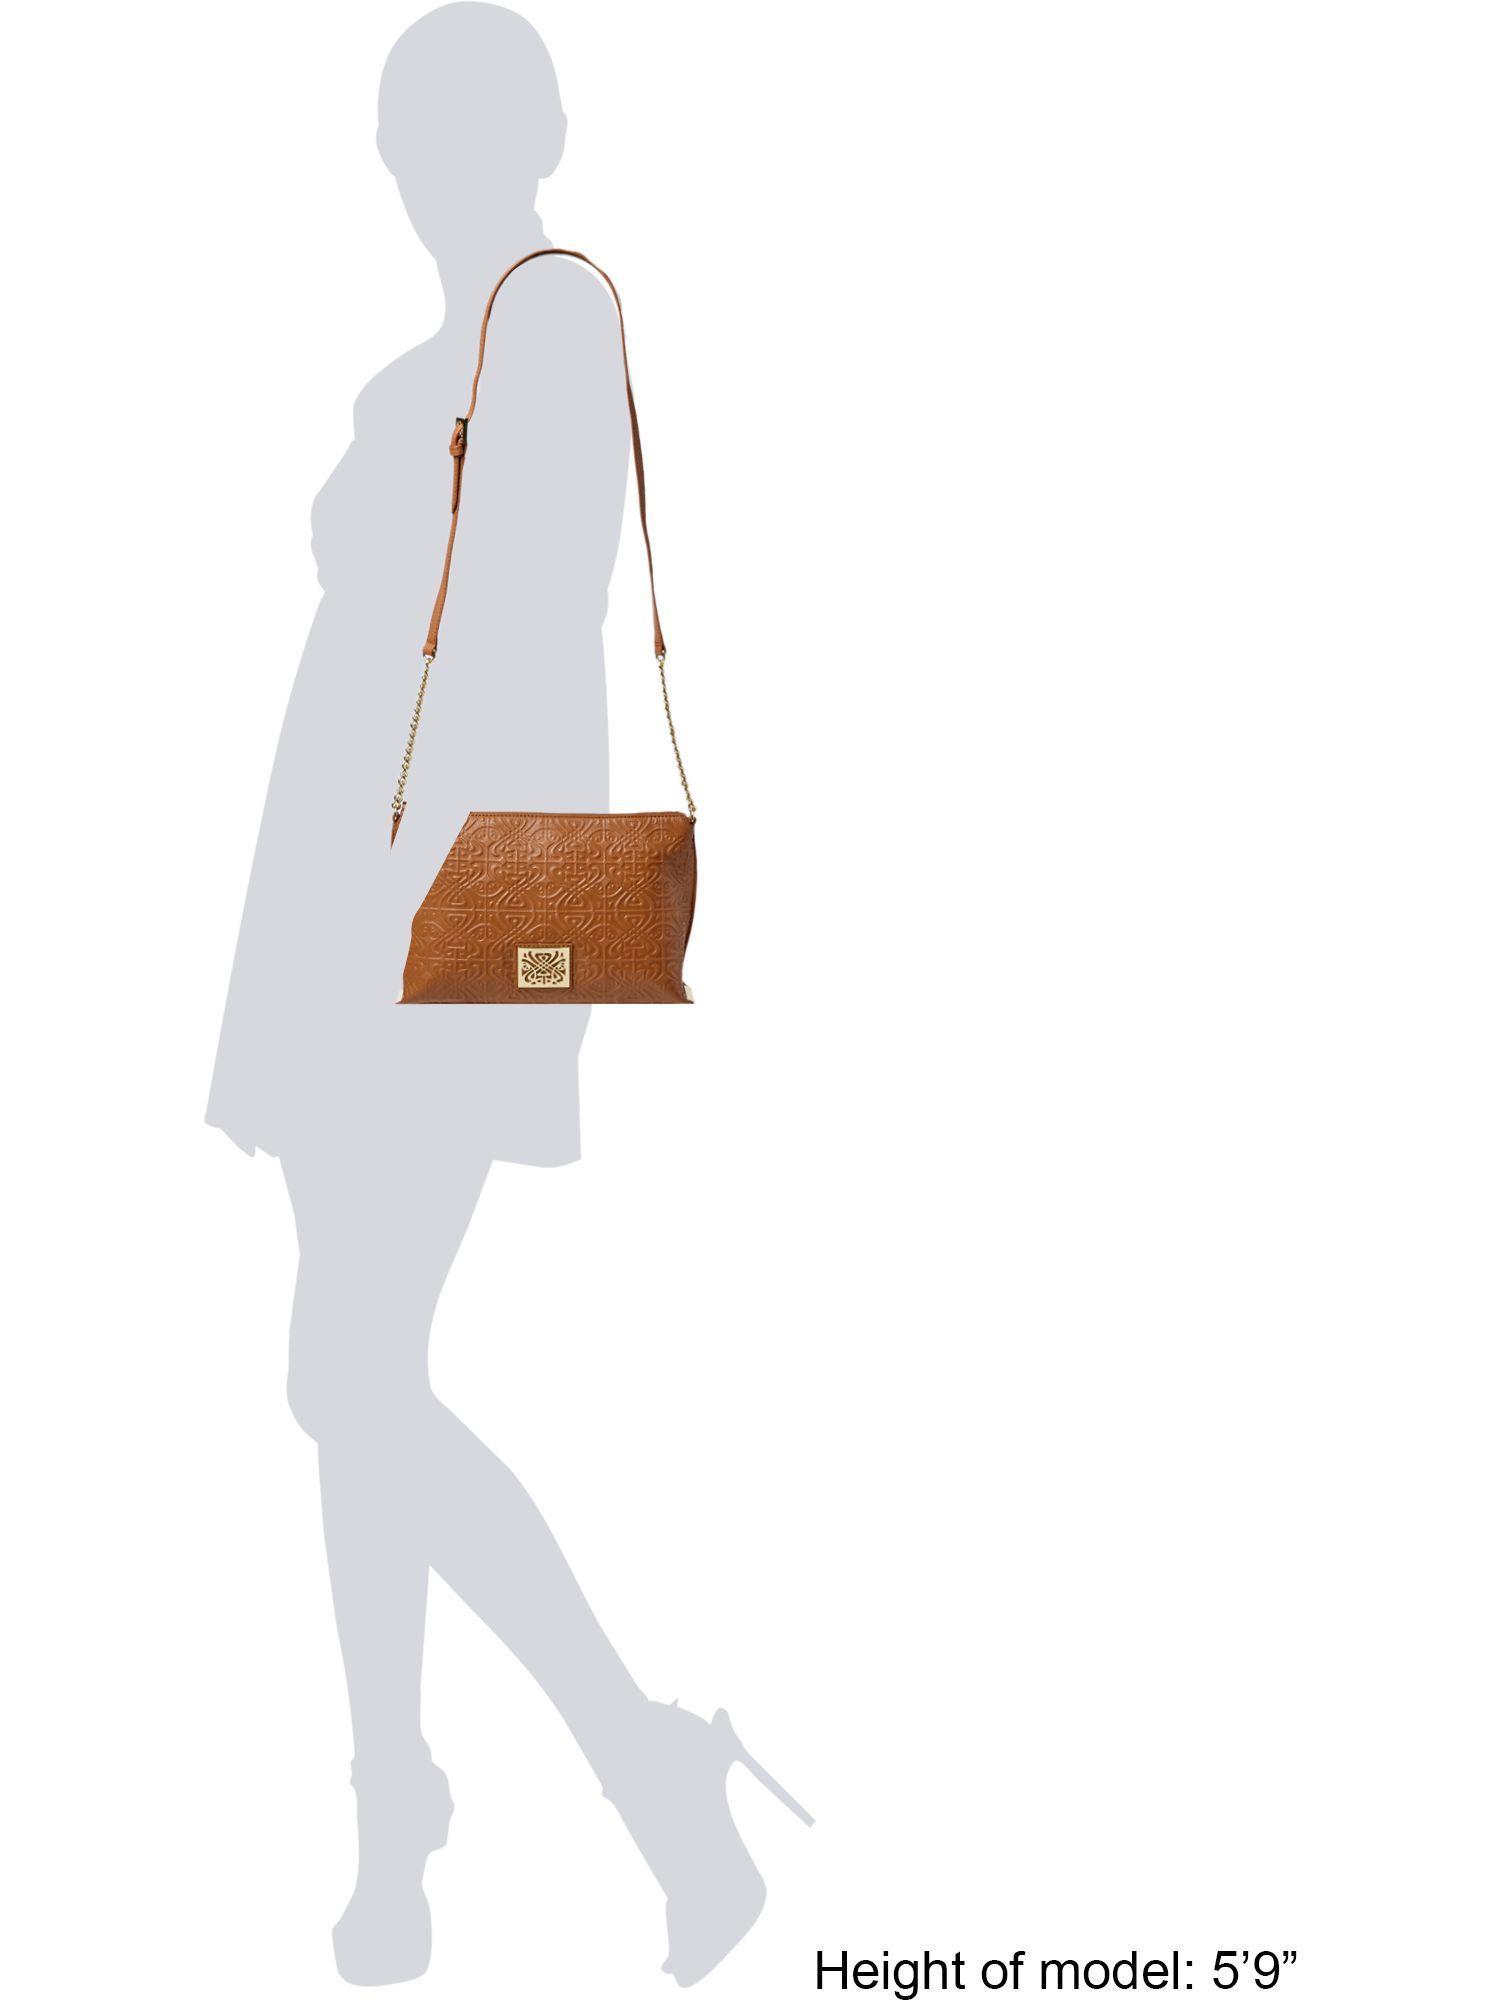 Biba Leather Constance Crossbody Bag in Brown